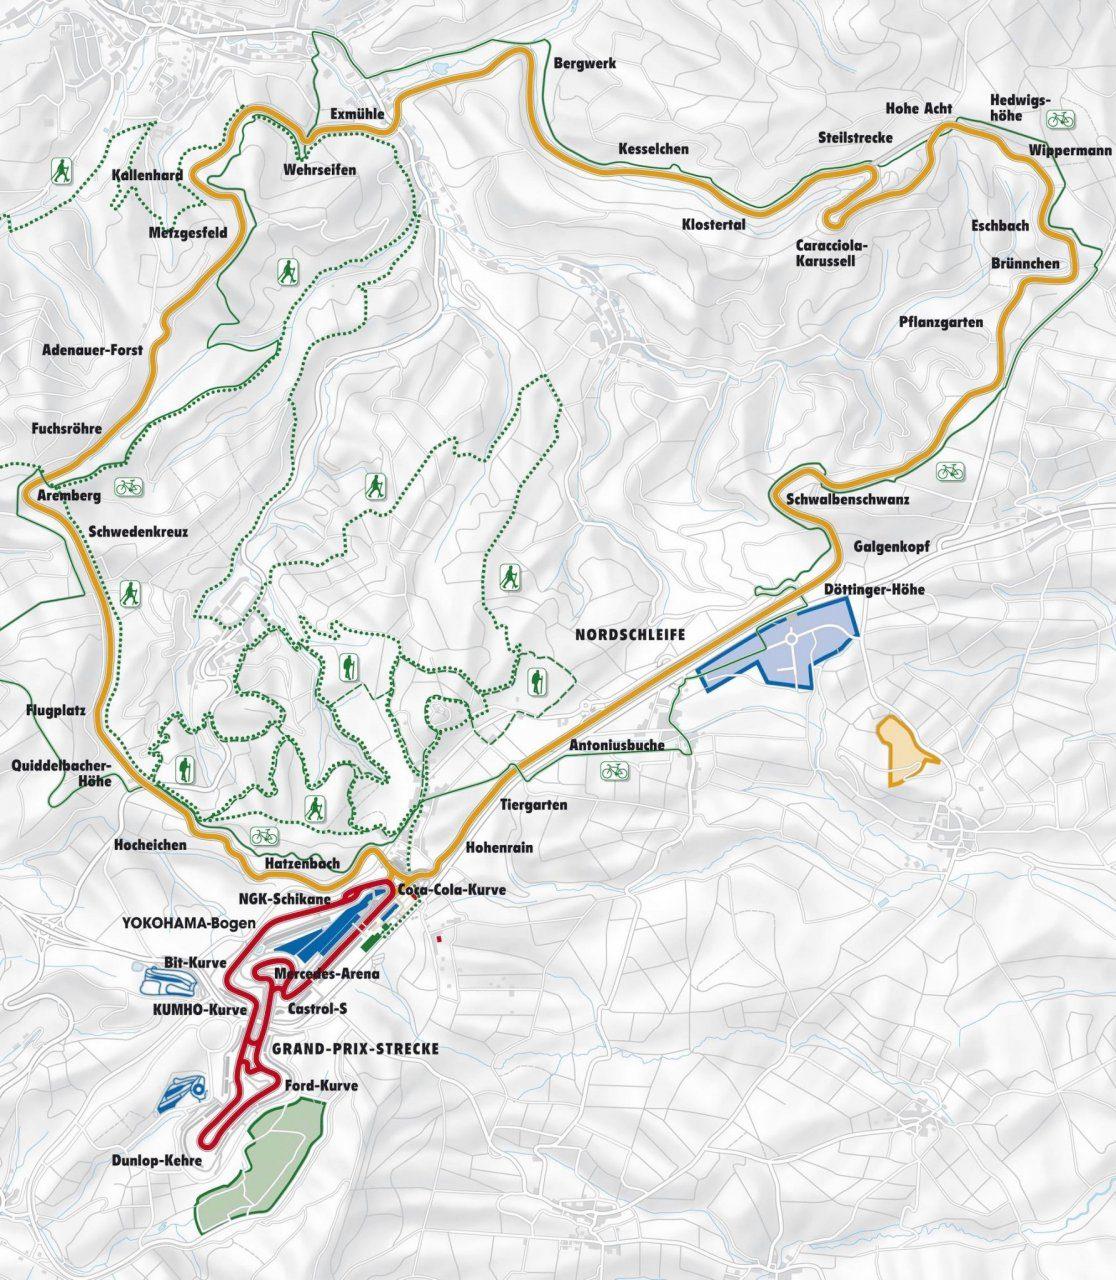 Nurburgring Nordschleife circuito